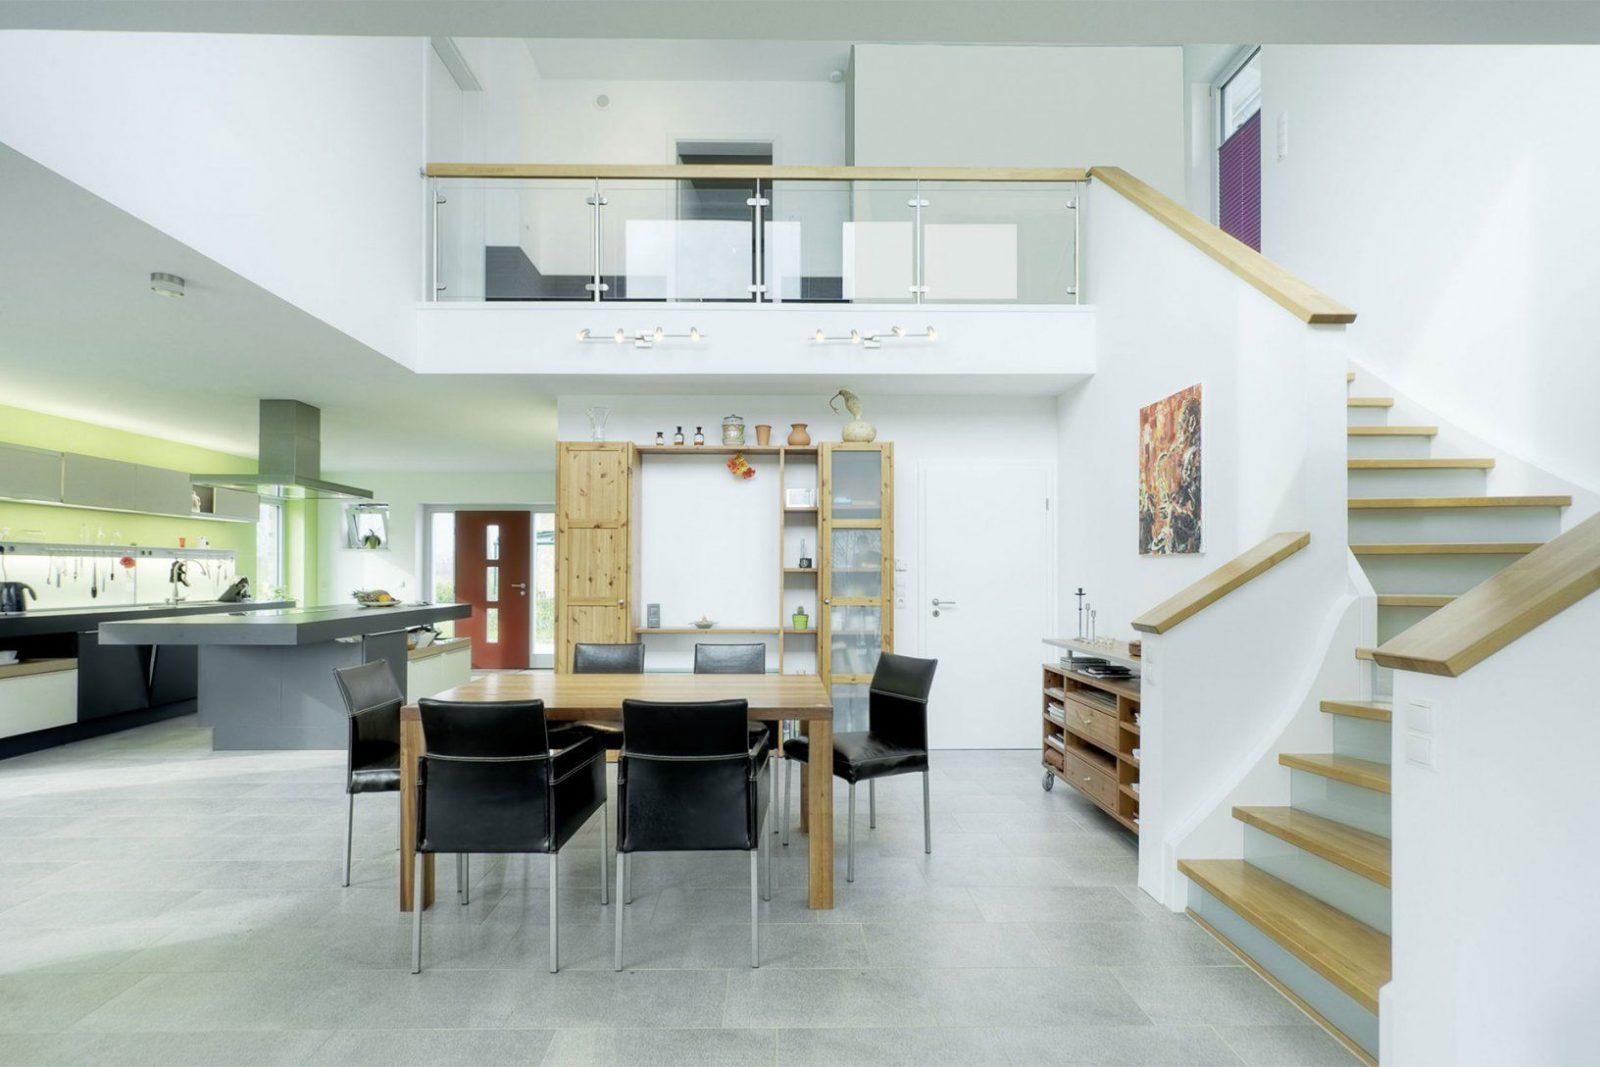 Haus Mit Offener Galerie Medium Size Of Fr Grundrisse Fr Ihr Haus von Haus Mit Offener Galerie Photo